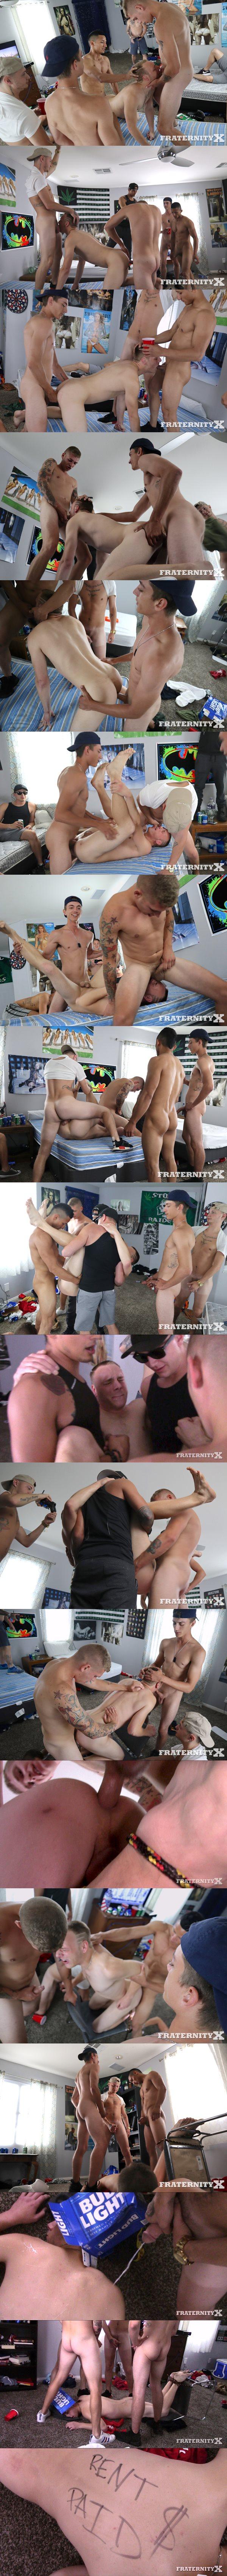 Aaron, Jonas, Mateo and Matthew Marshall gangbang bareback drunk bitch Carlos Garcia in Rent Paid at Fraternityx 02